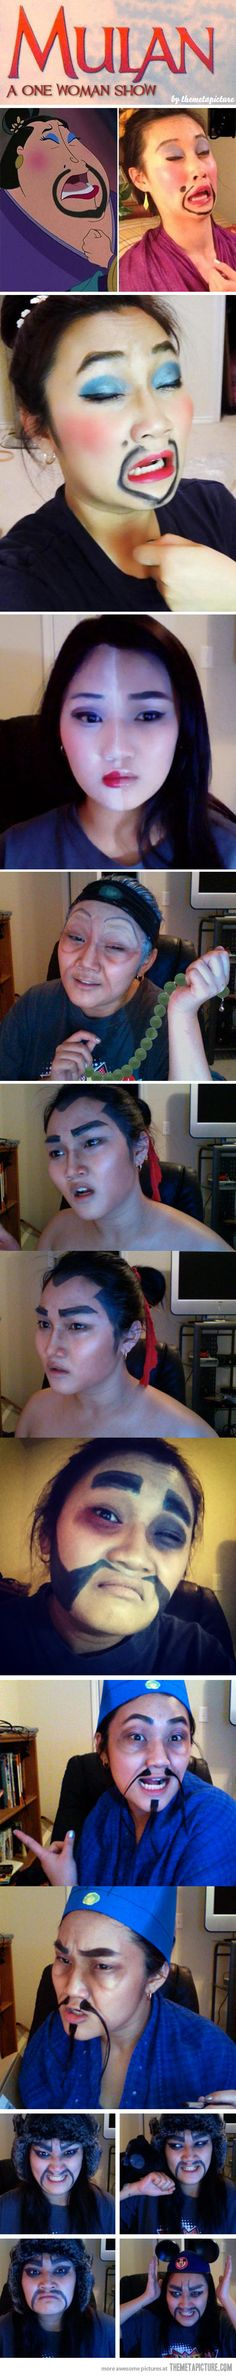 Mulan, a one woman show…